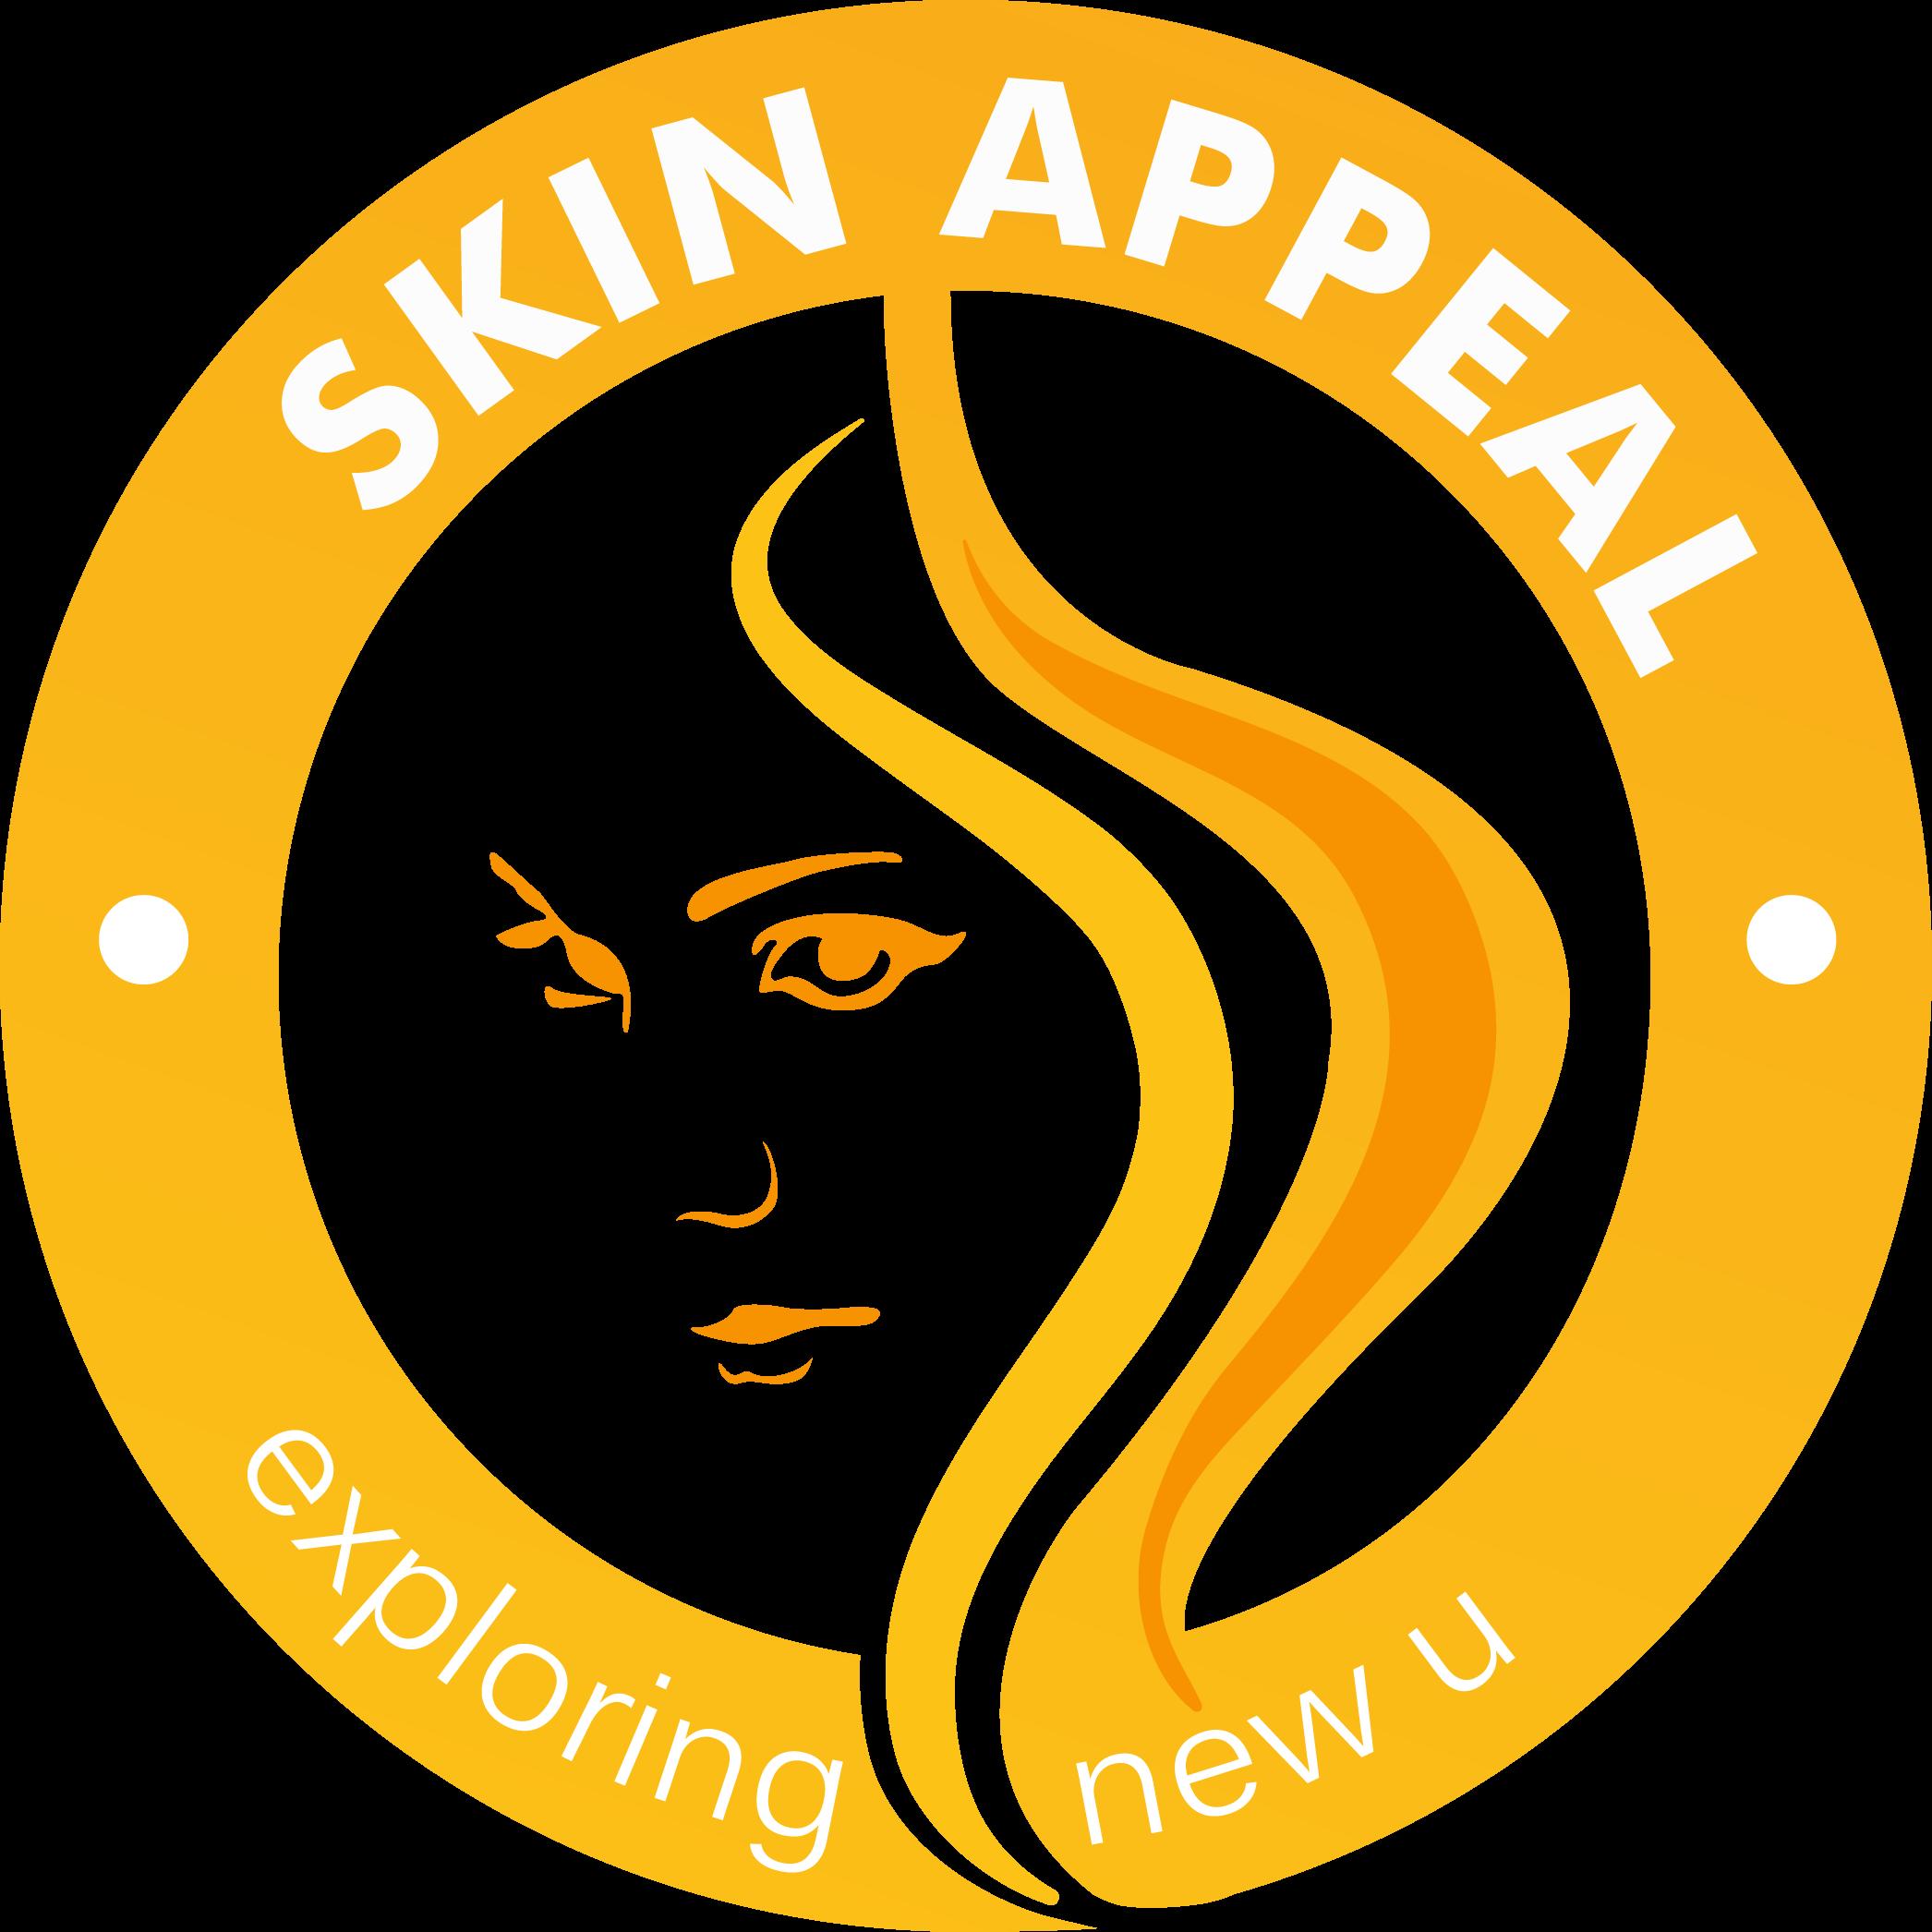 Skin clipart skin problem. Appeal twitter